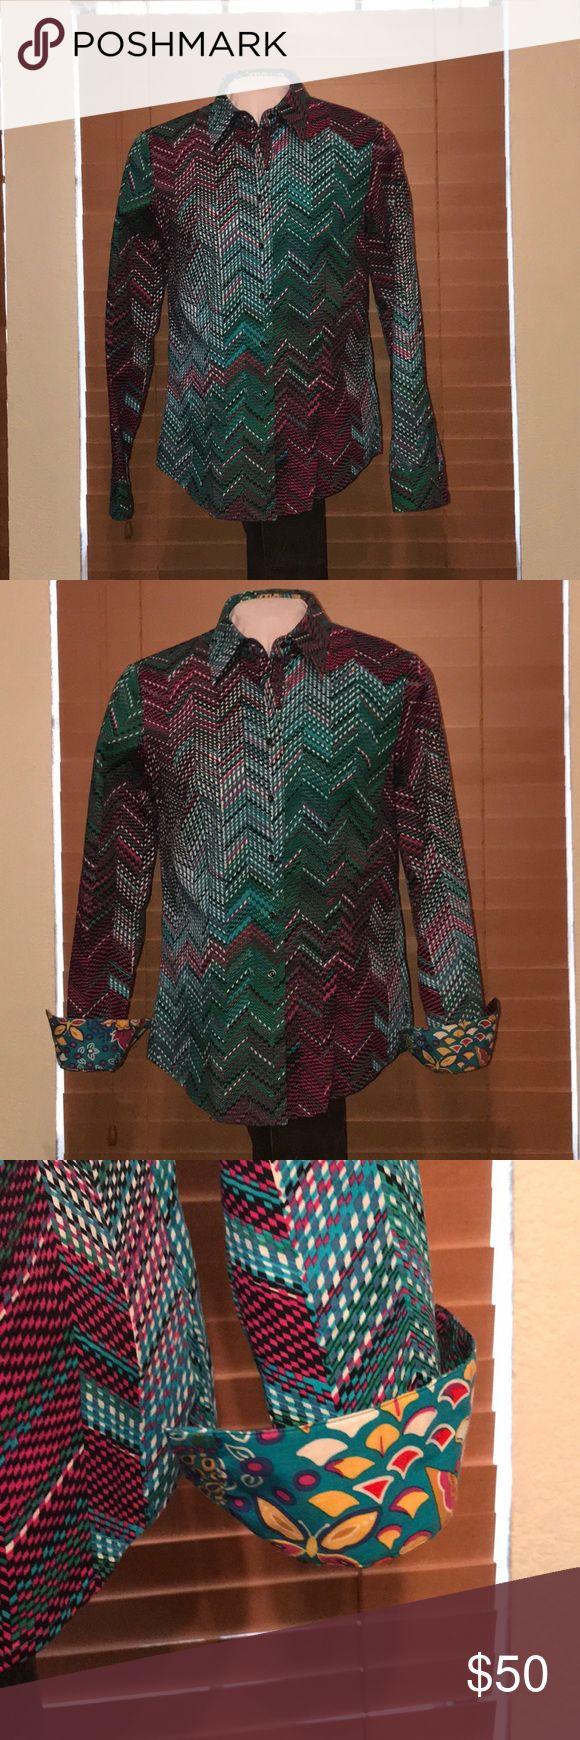 Robert Graham Blouse Gorgeous Robert Graham Blouse in shades of teal, pink and blues. EUC Robert Graham Tops Button Down Shirts